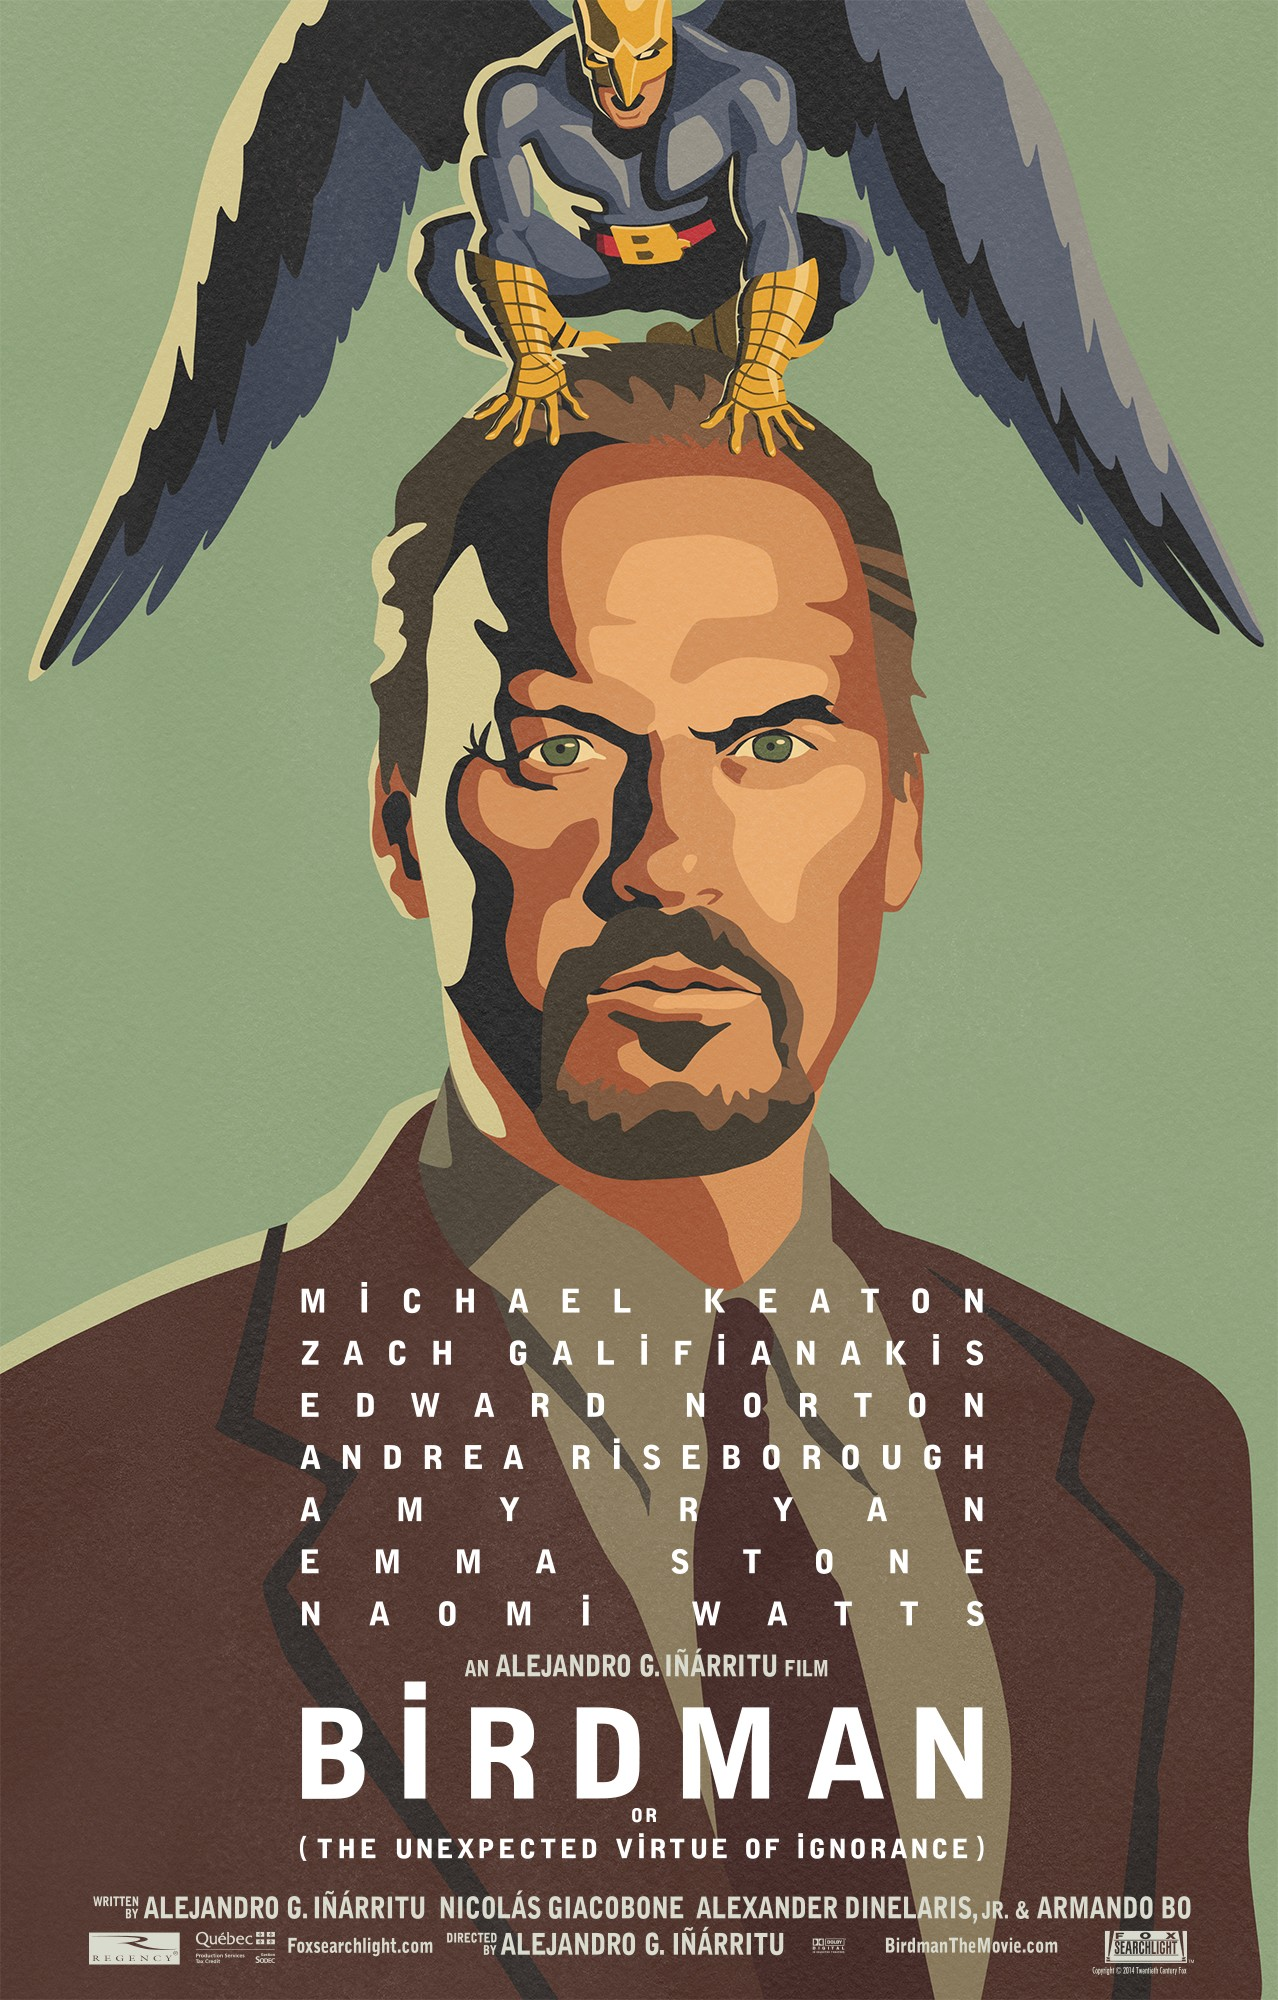 Mega Sized Movie Poster Image for Birdman